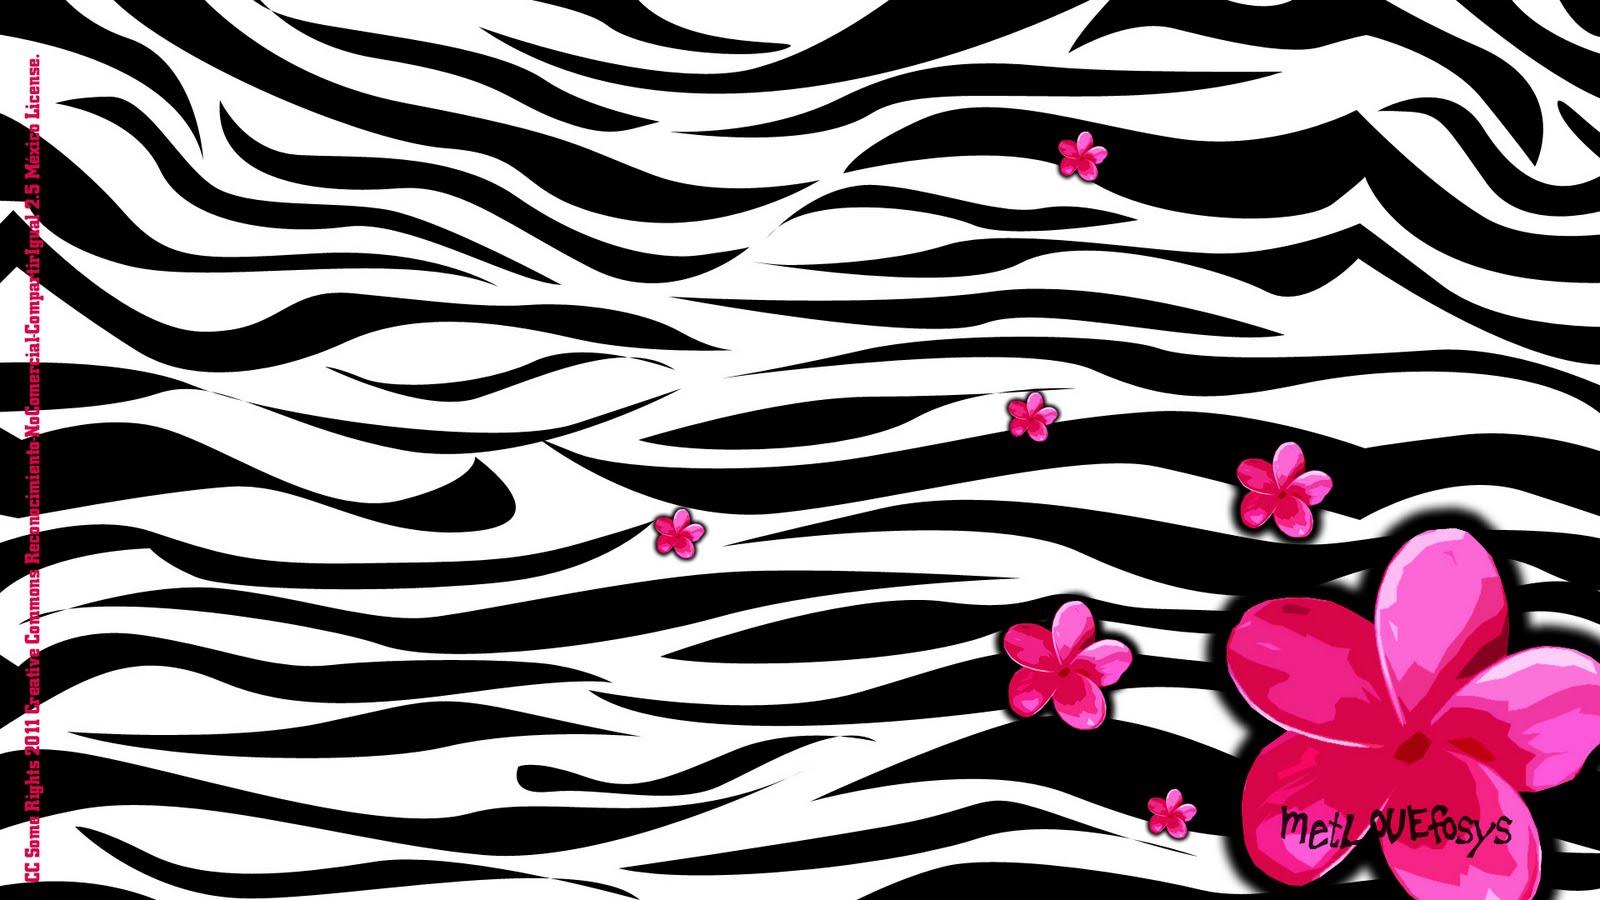 wwWallpaper ]-: wallpaper cebra y flor